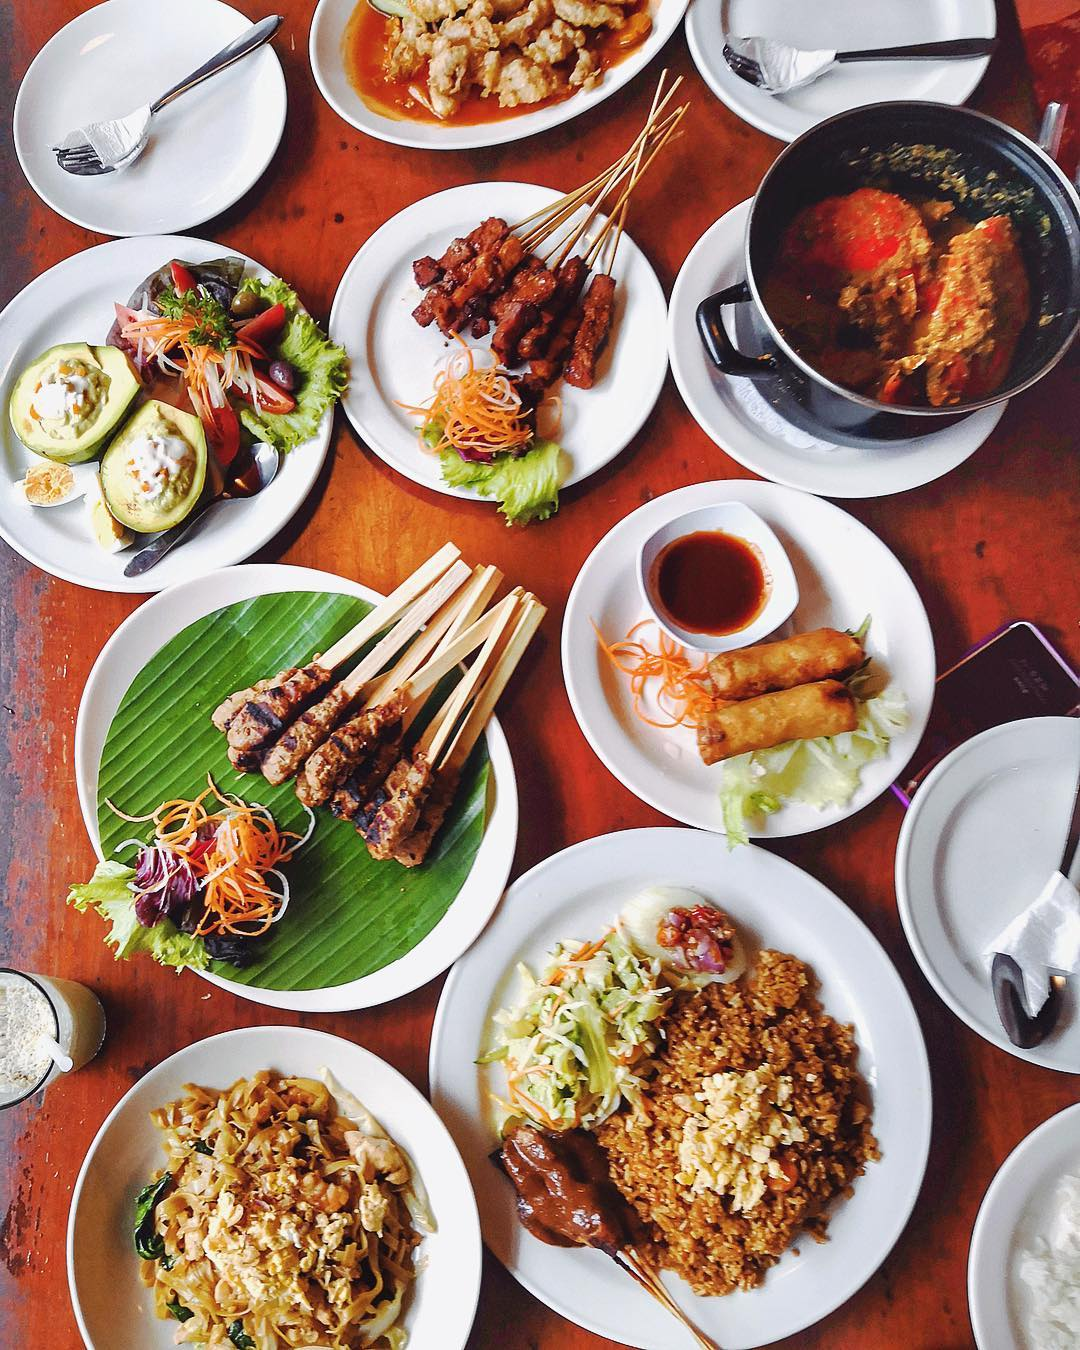 Seminyak Restaurants: Warung Made Seminyak by @ulrikkelocke